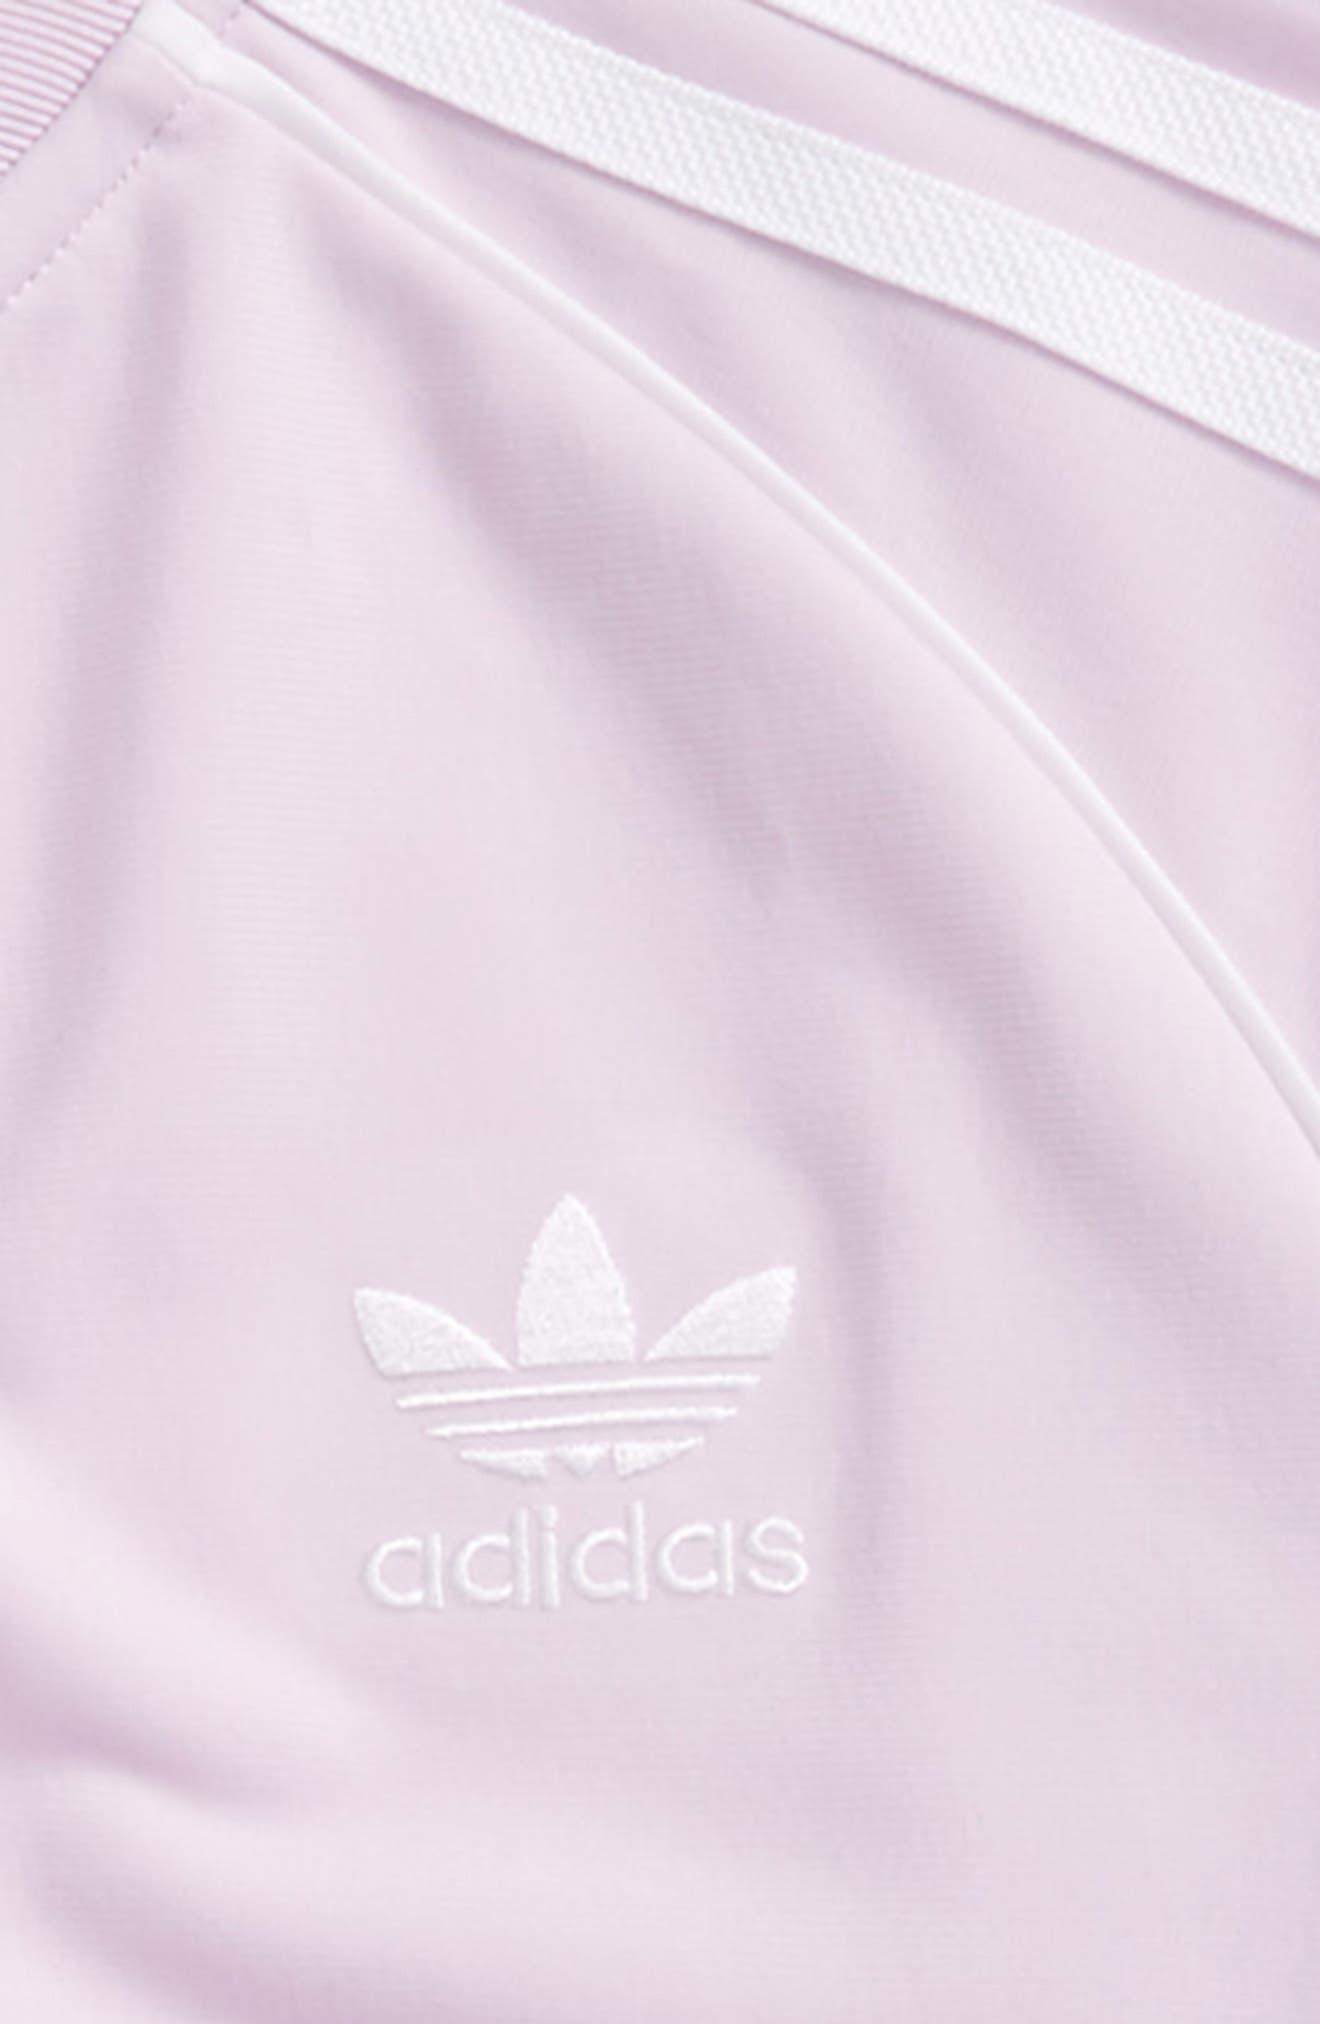 adidas SST Track Jacket,                             Alternate thumbnail 2, color,                             682